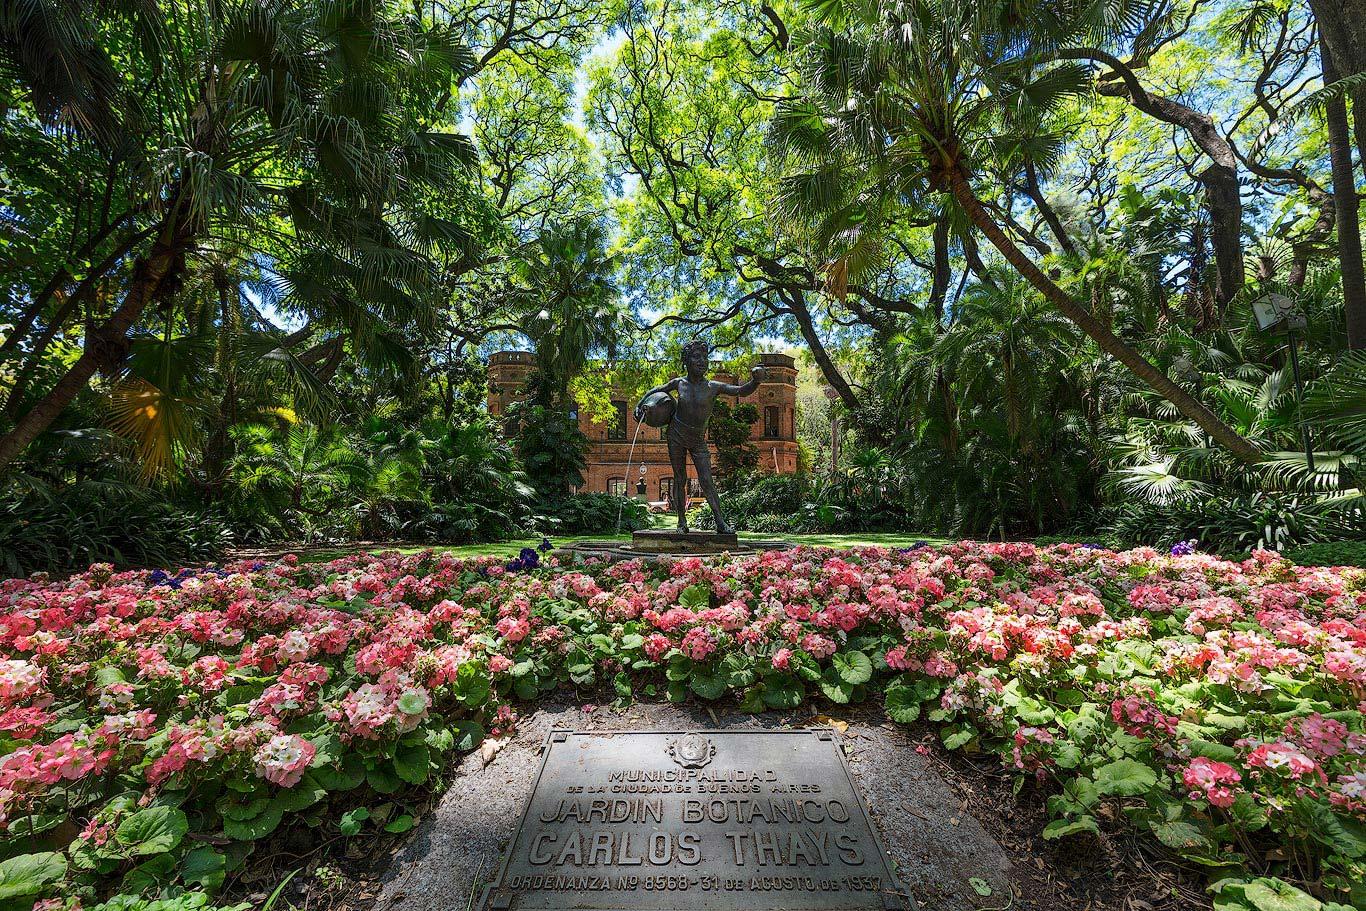 Jardin Botanico in Buenos Aires